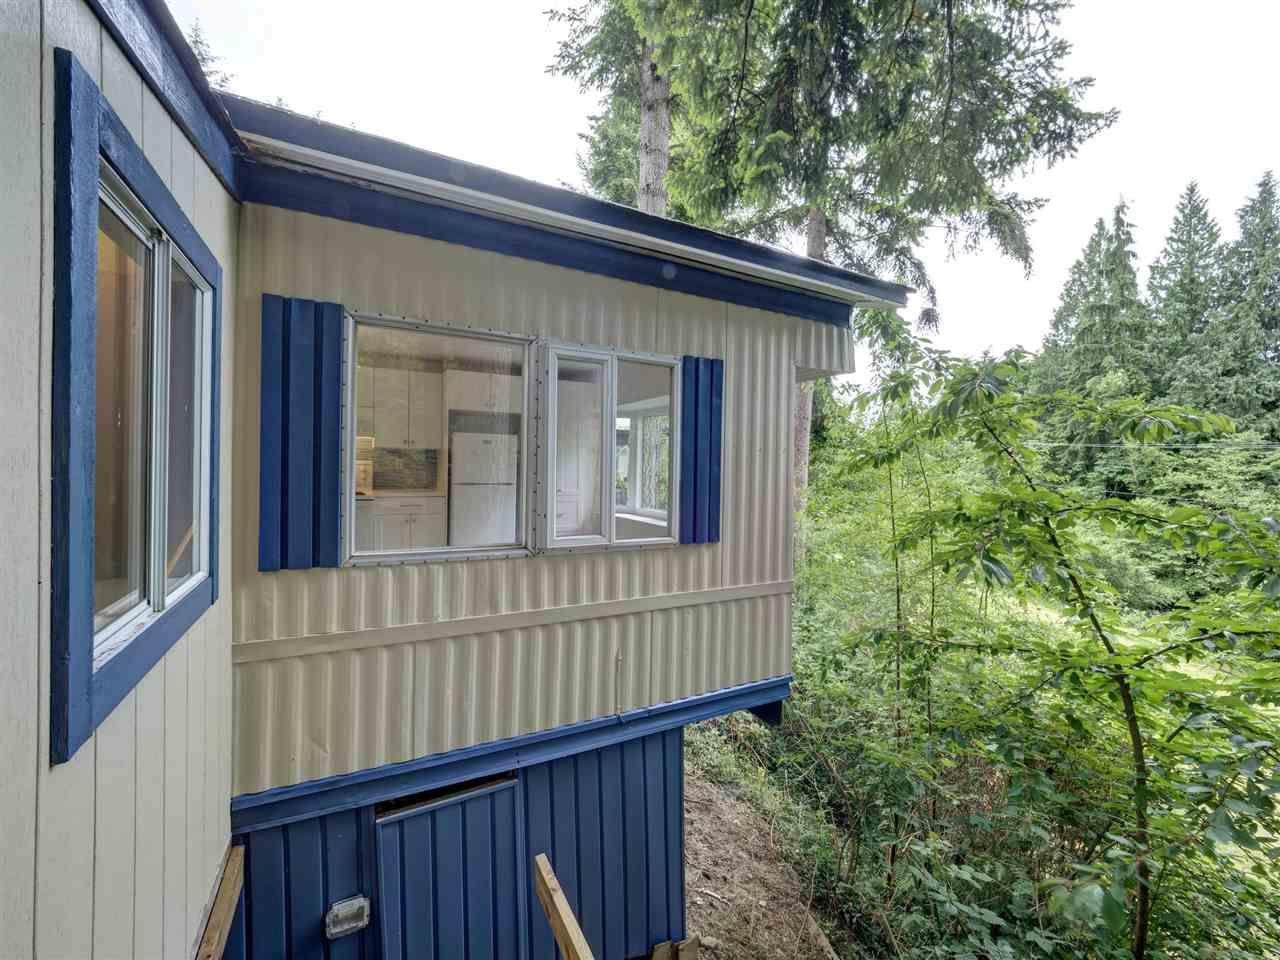 "Main Photo: 12 5294 SELMA PARK Road in Sechelt: Sechelt District Manufactured Home for sale in ""Selma Vista"" (Sunshine Coast)  : MLS®# R2588410"